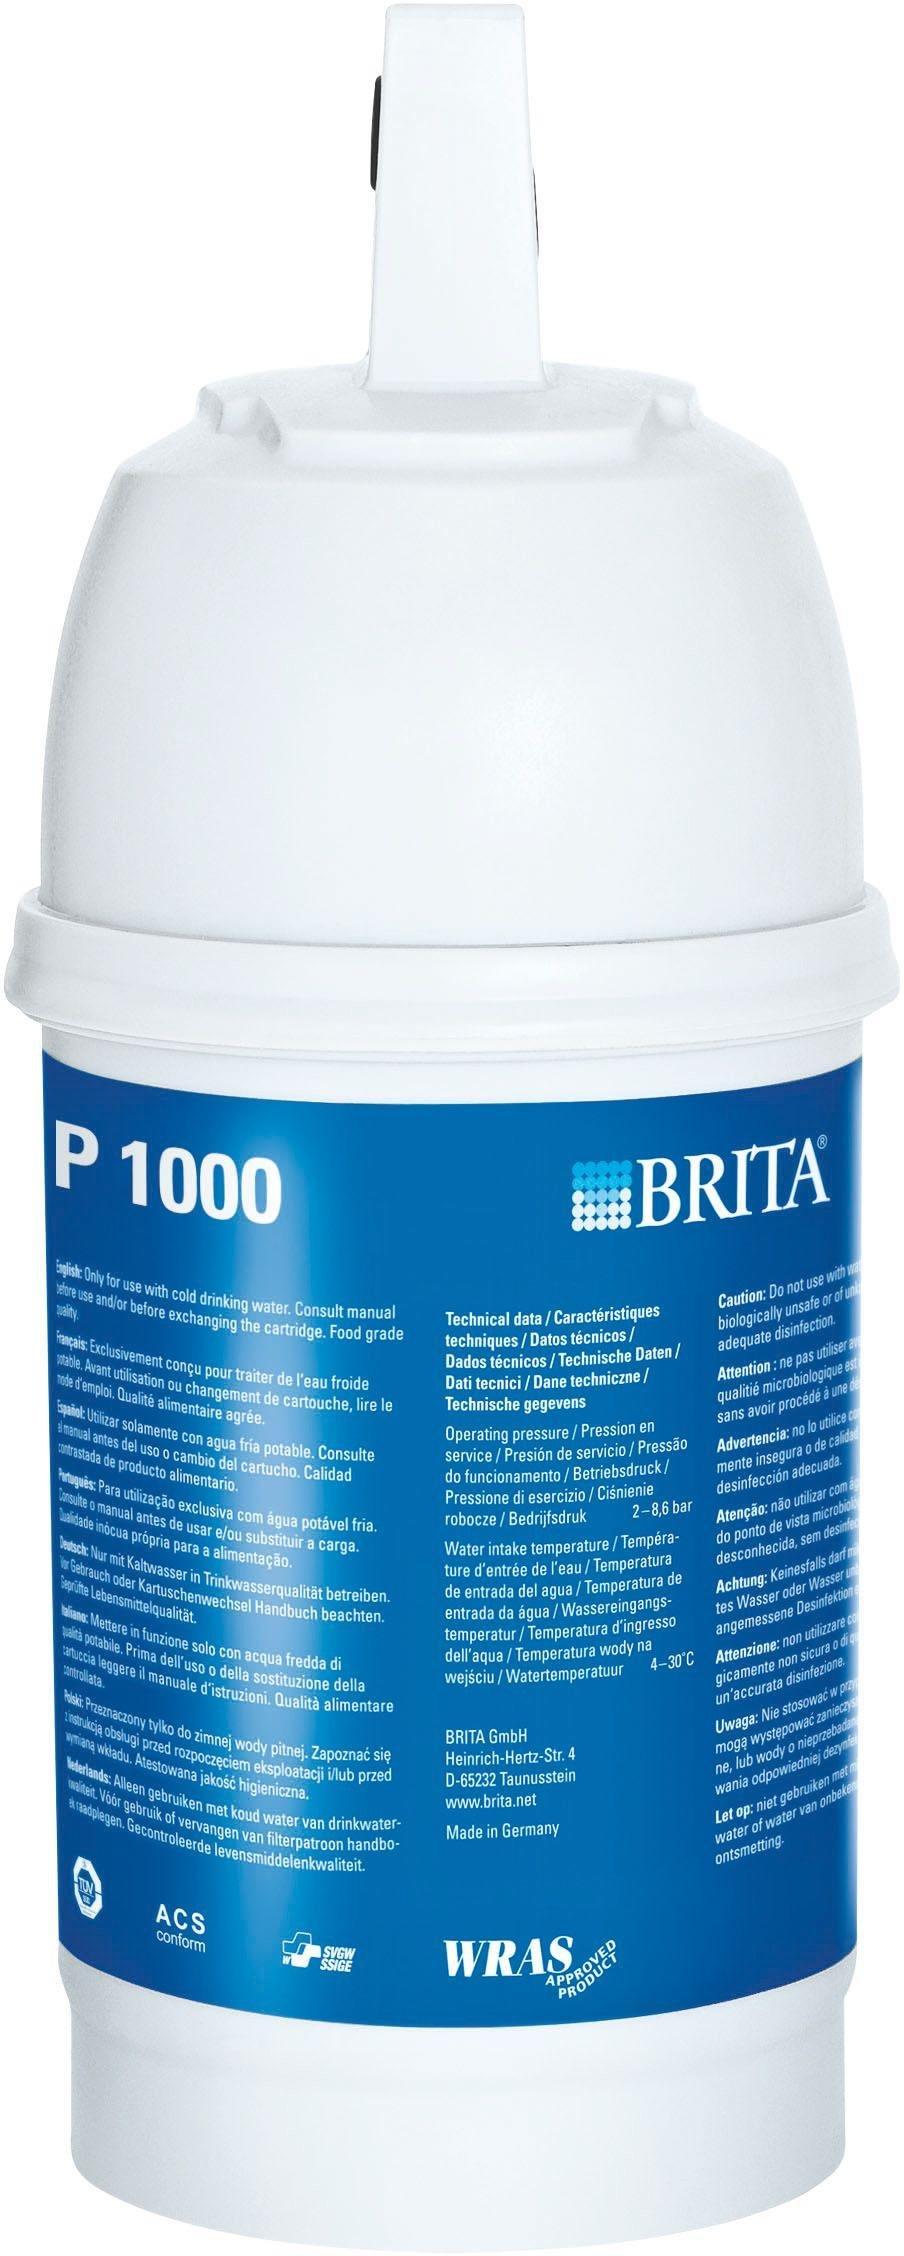 Buy Brita P1000 Tap Cartridge At Argos Co Uk Your Online